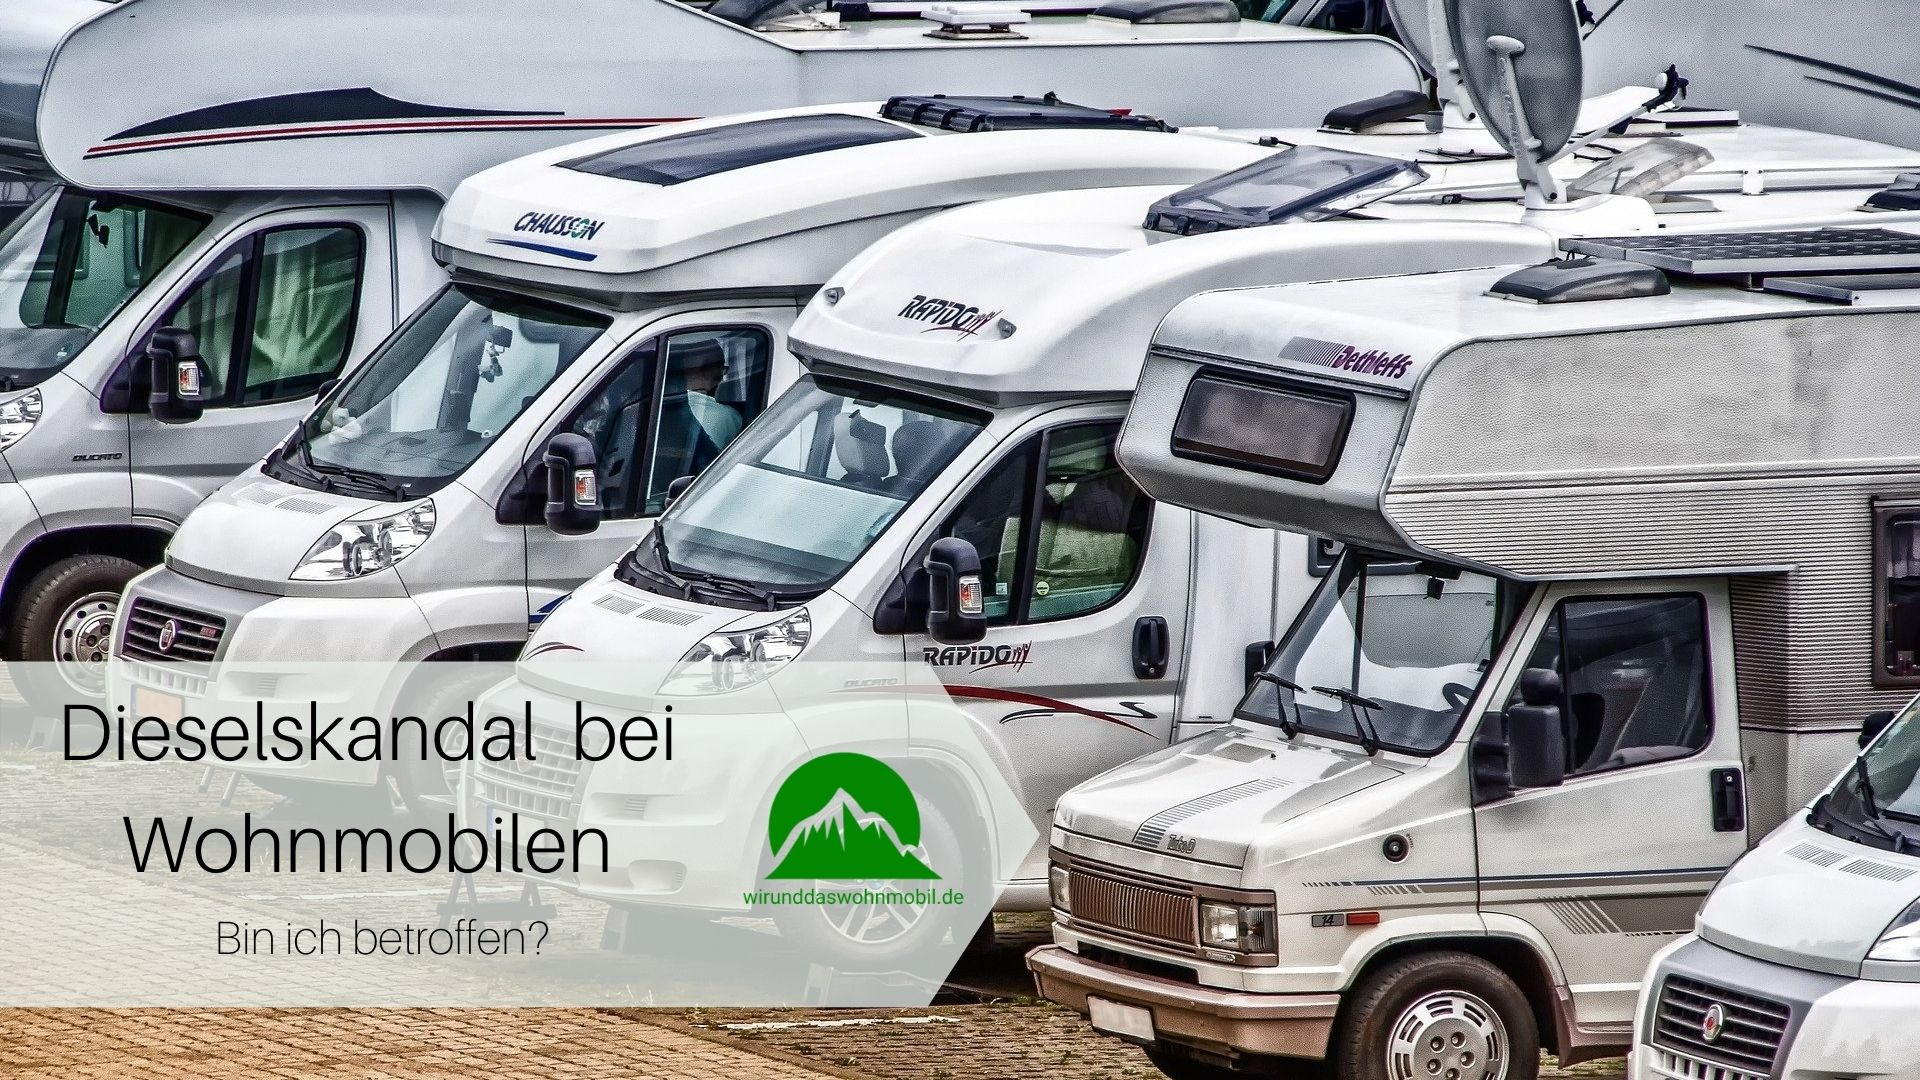 Titelbild Wohnmobile Dieselskandal